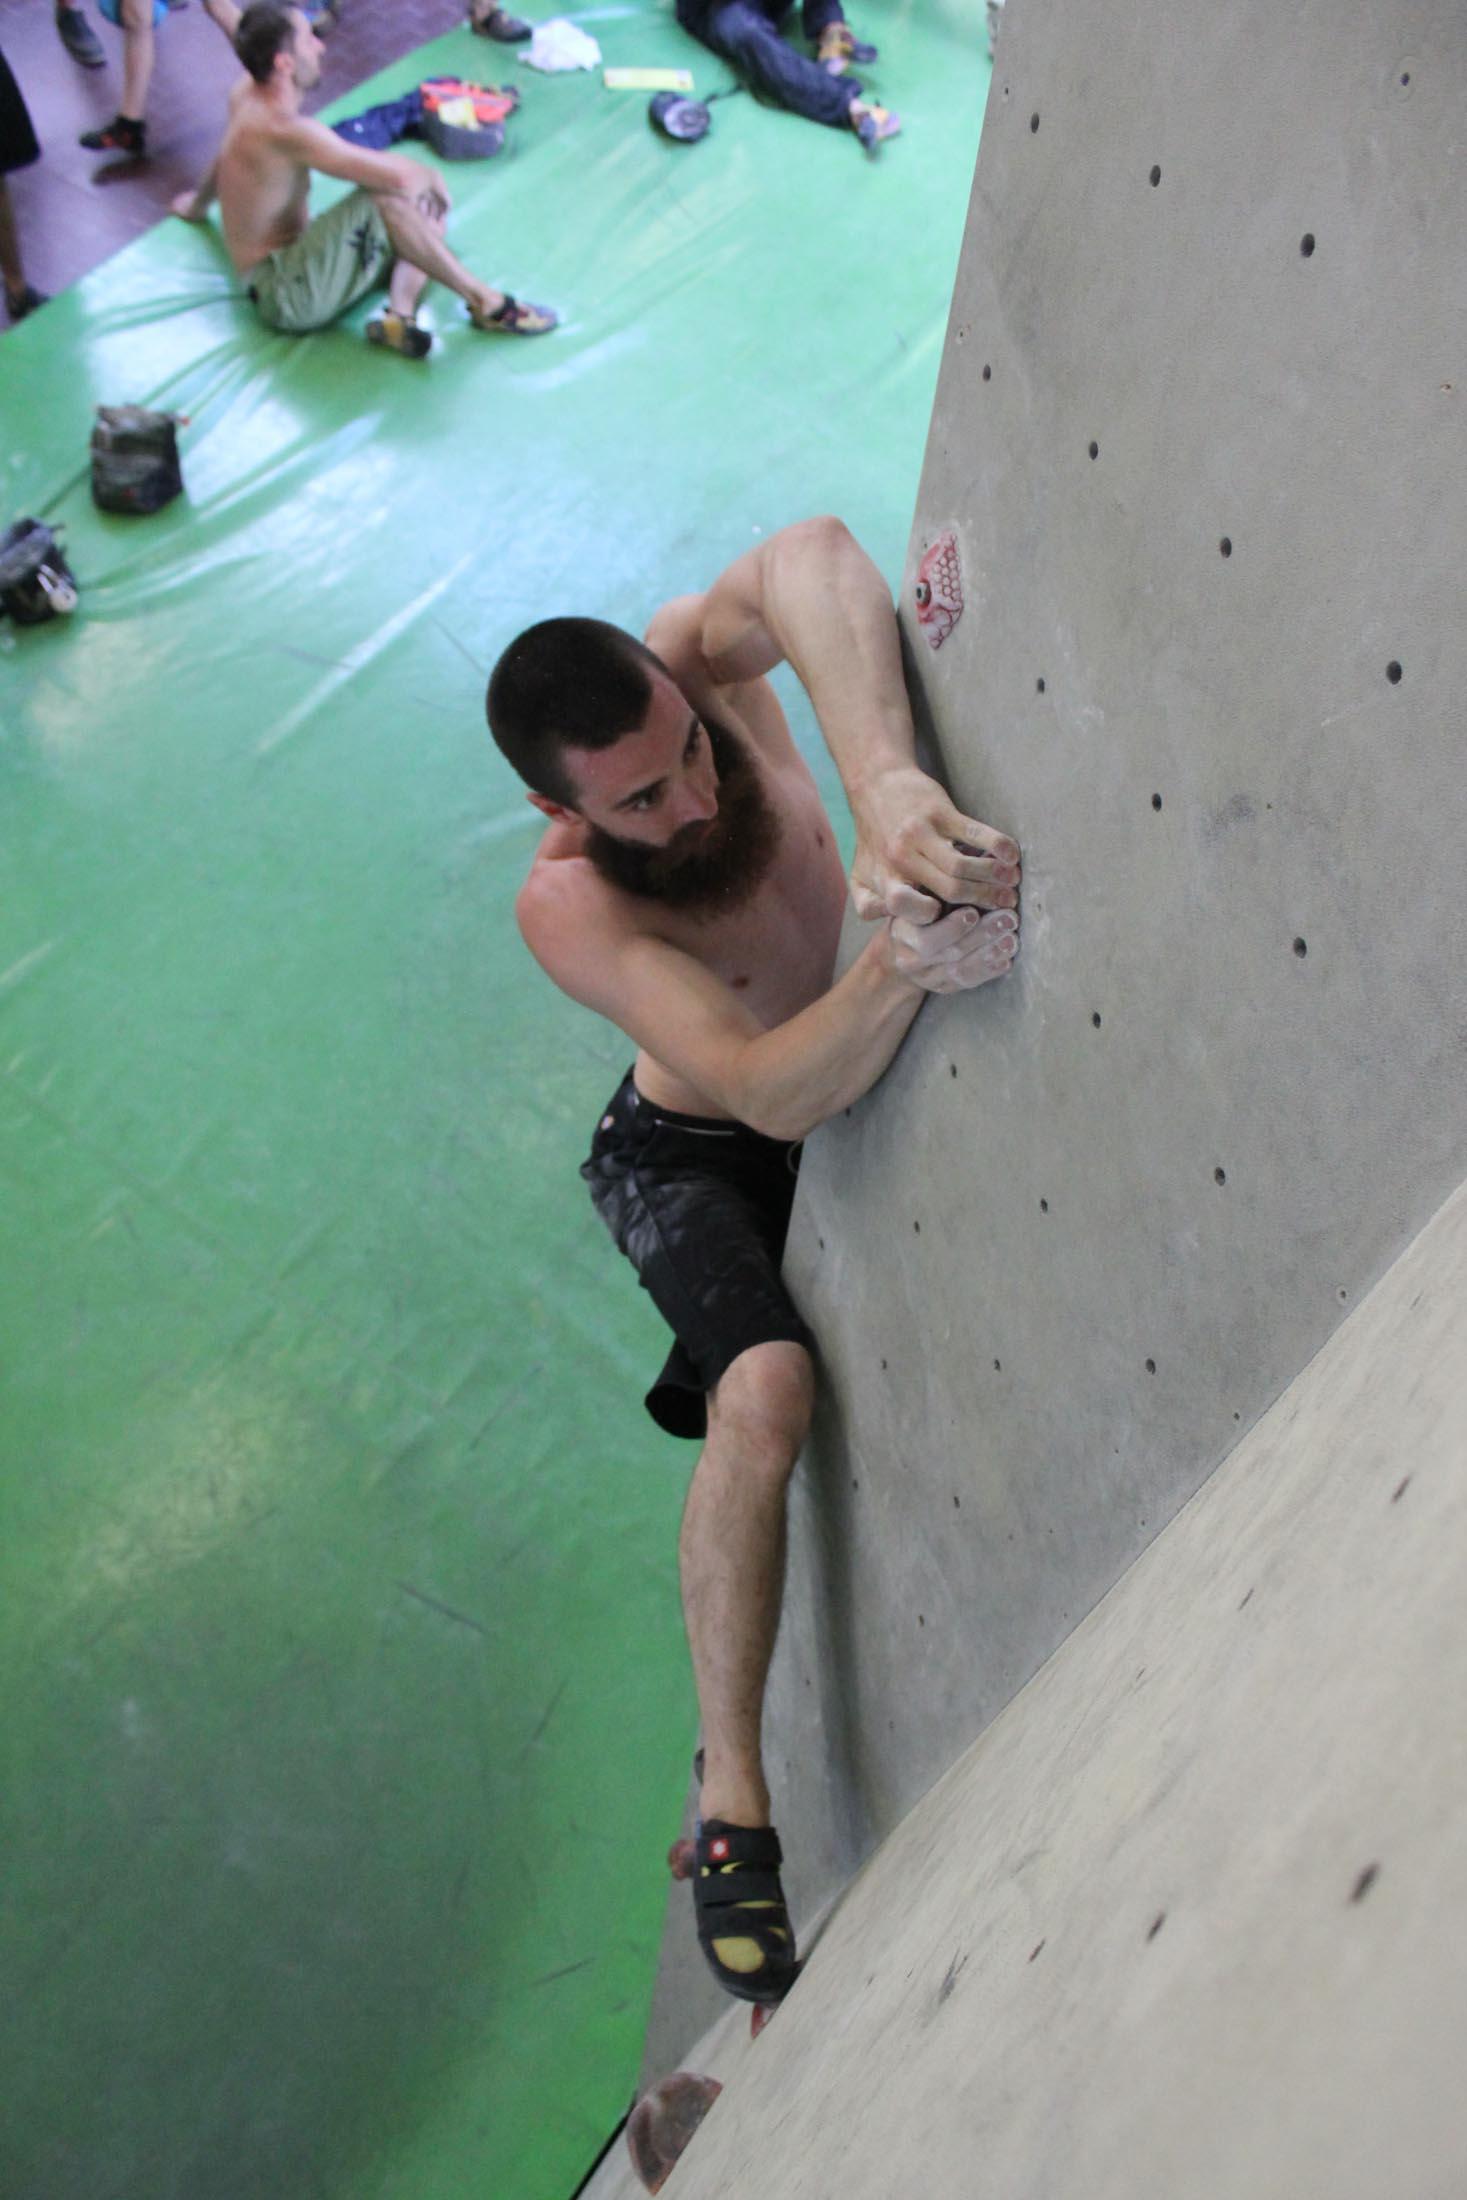 Quali, internationaler bouldercup Frankenjura 2016, BLOCKHELDEN Erlangen, Mammut, Bergfreunde.de, Boulderwettkampf07092016142